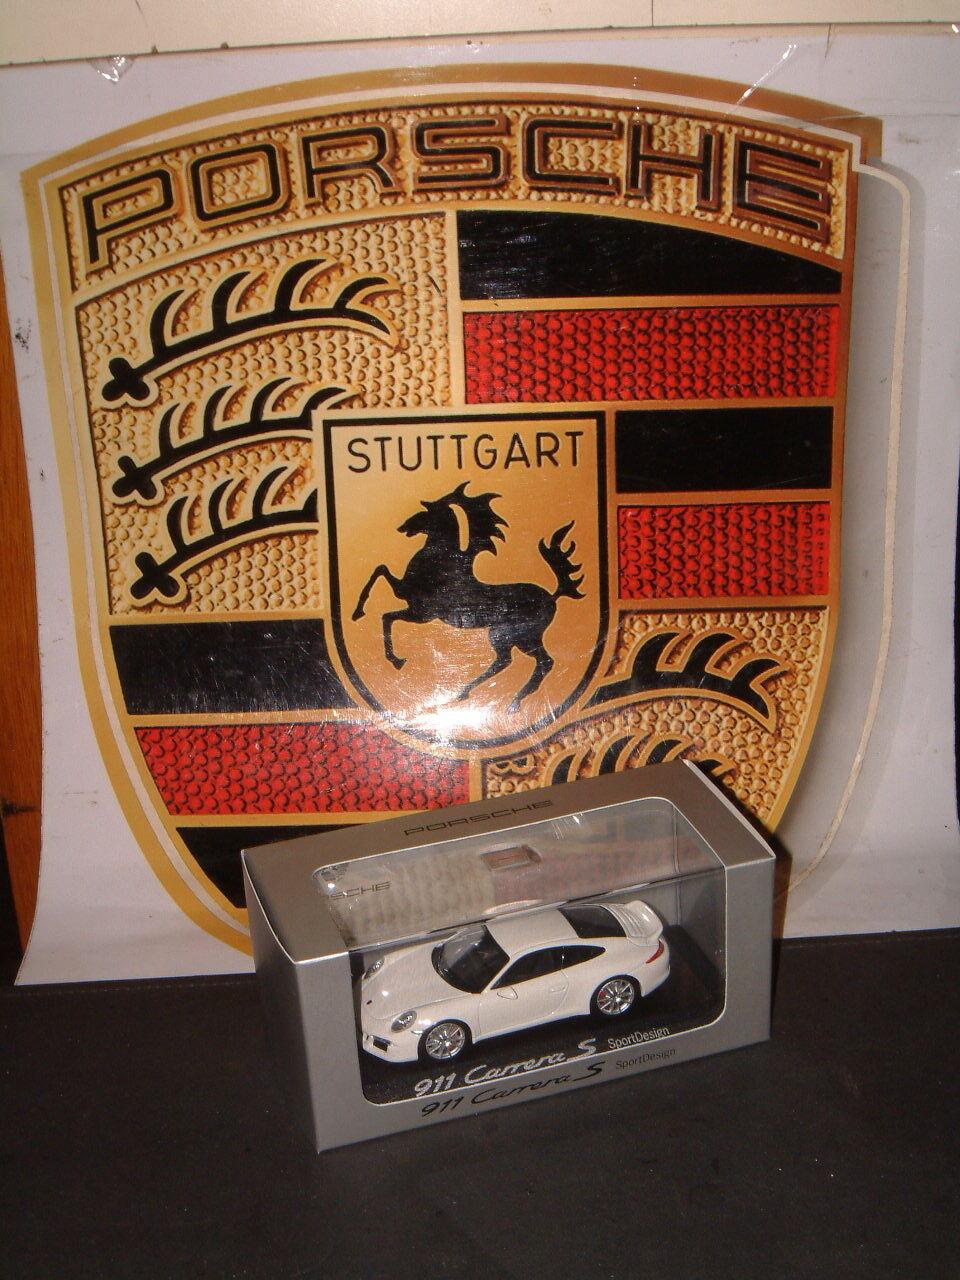 PORSCHE DESIGN DRIVER'S SELECTION  SPORTDESIGN  911 1 43 SCALE MODEL  NIB